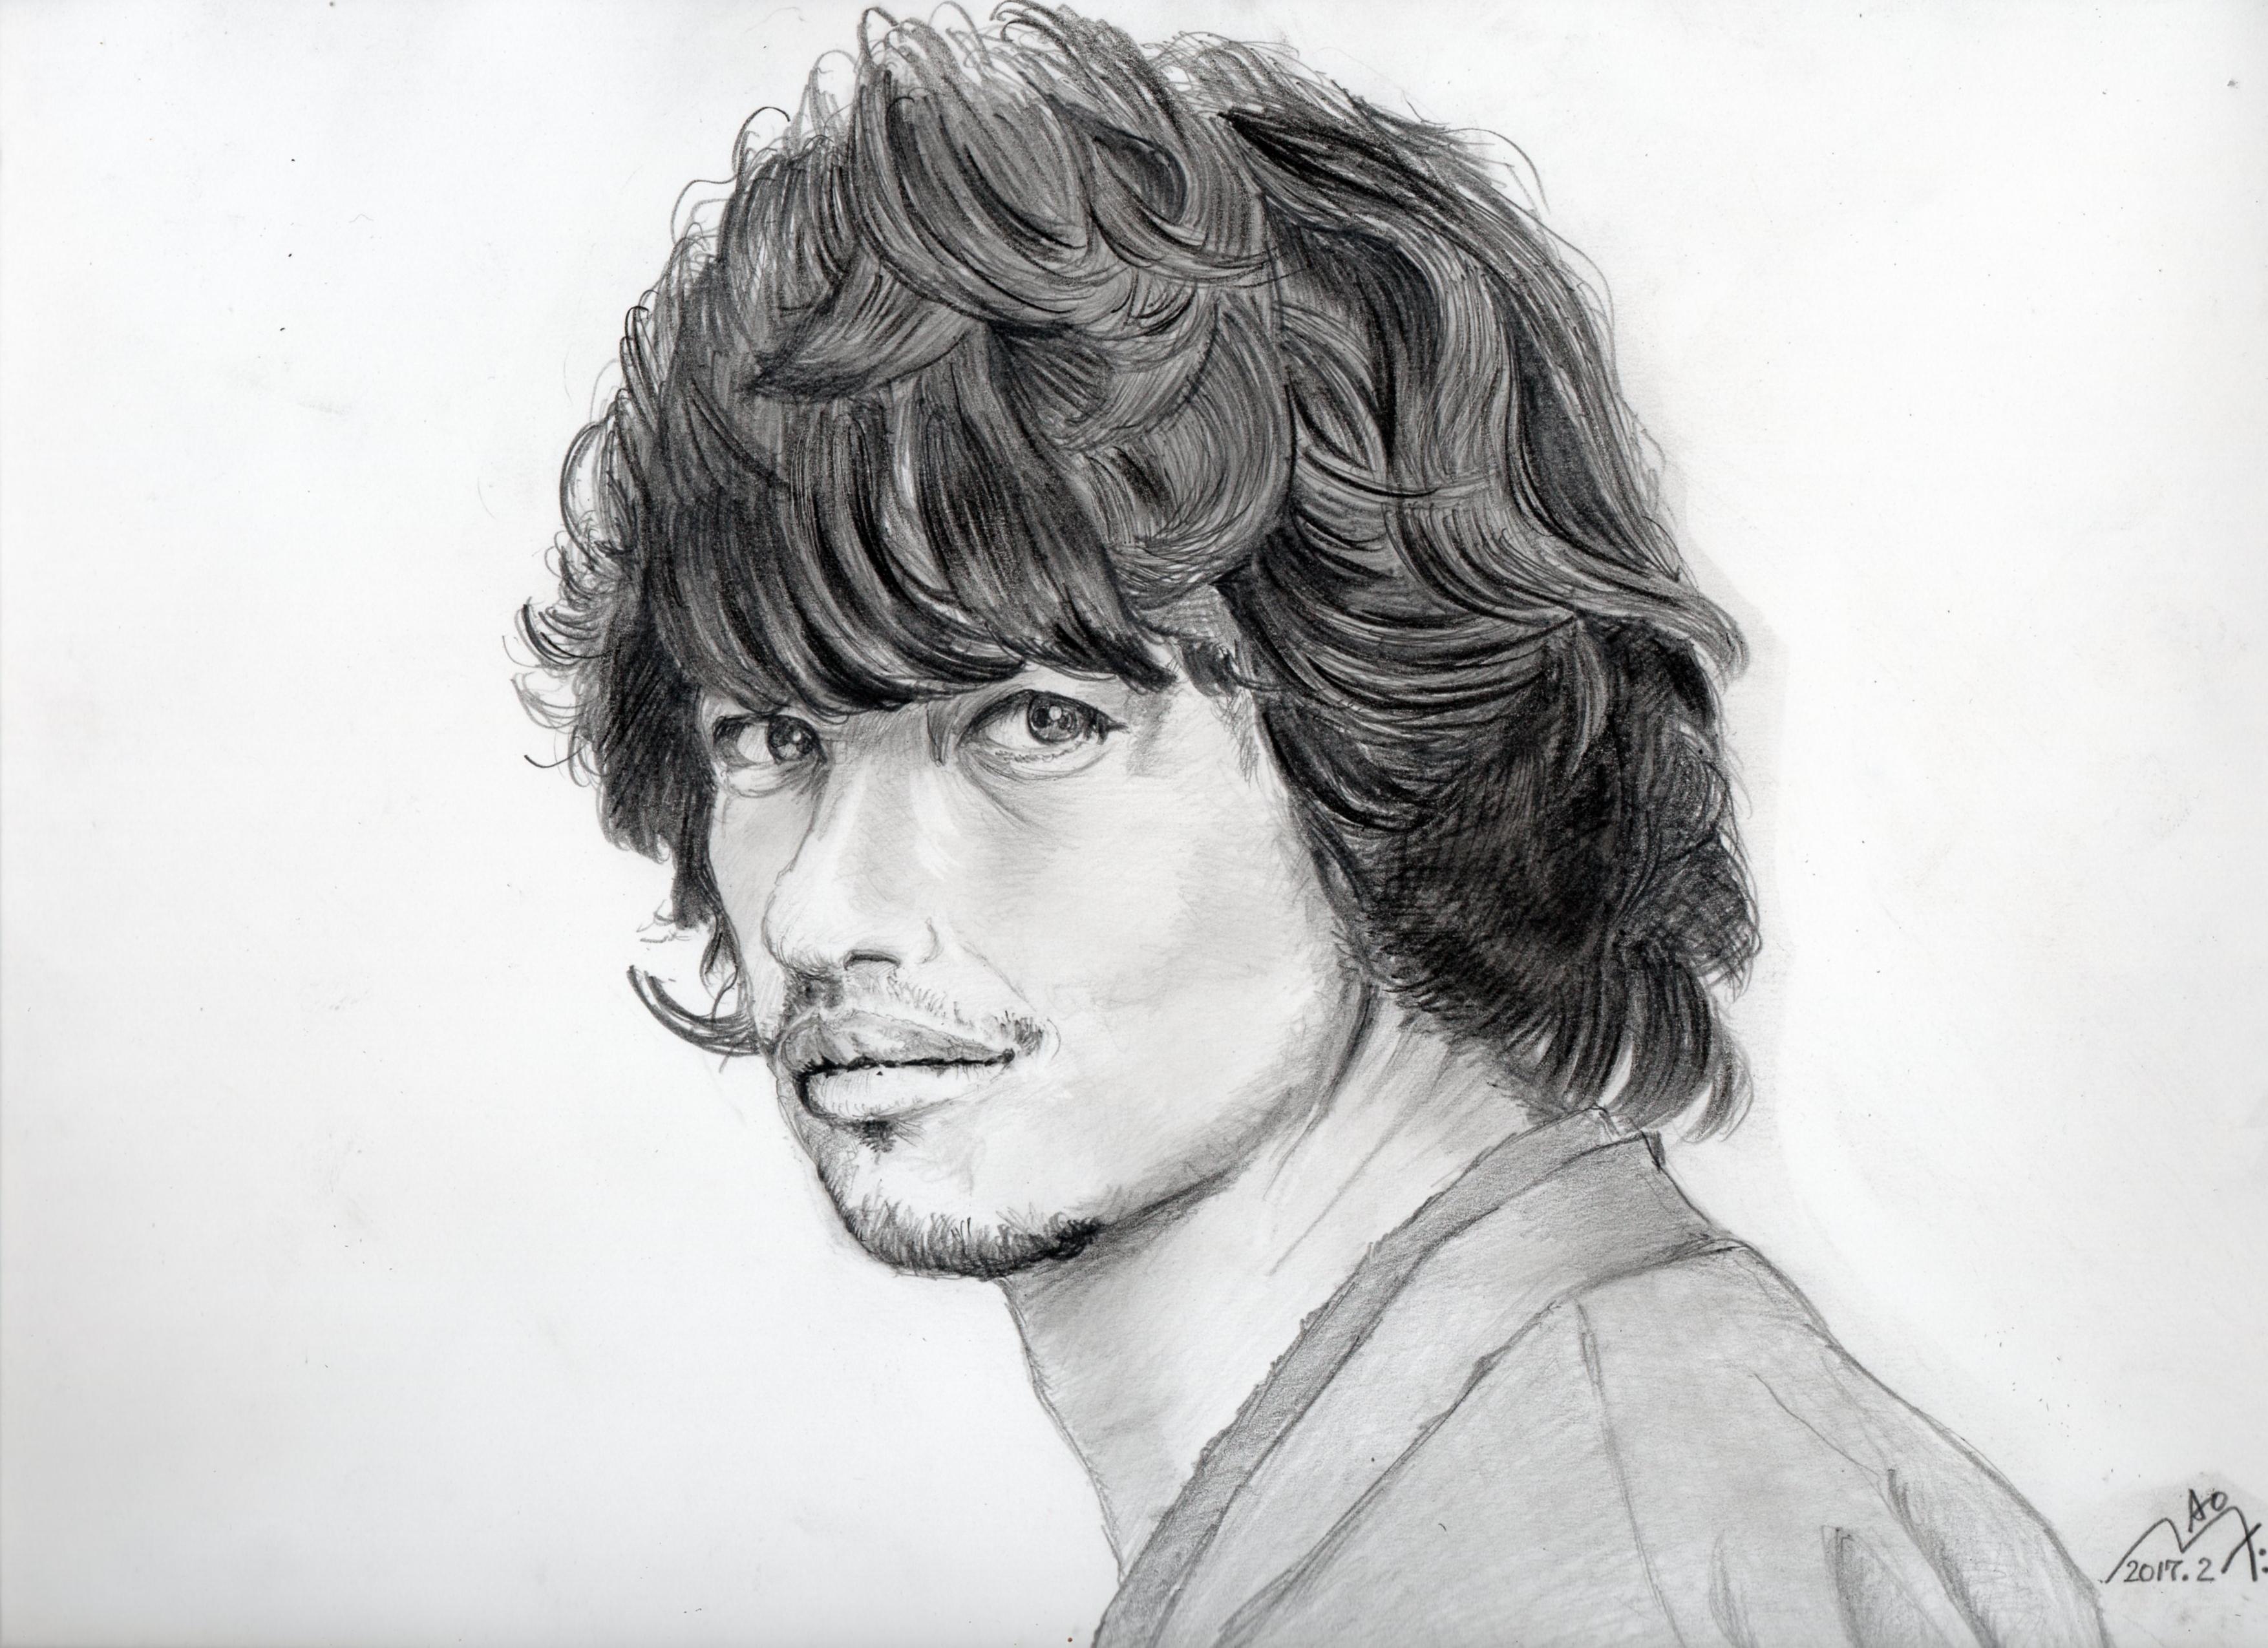 斎藤工の鉛筆画似顔絵